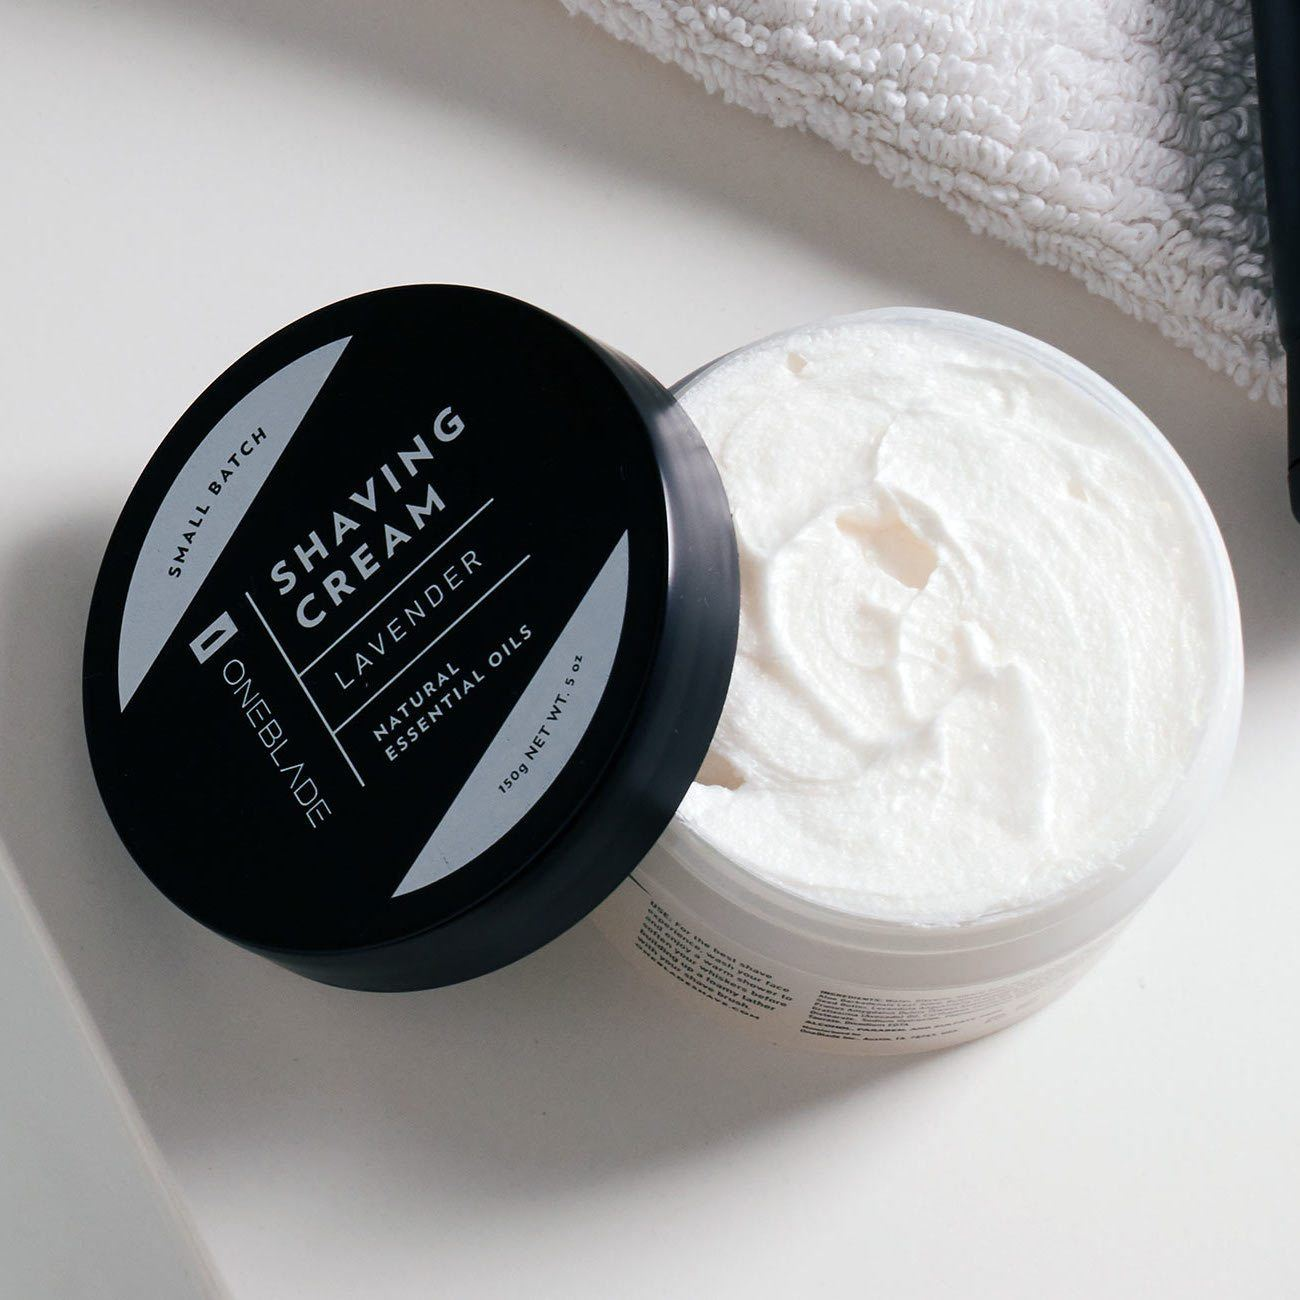 OneBlade Black Tie Shaving Cream with lid off